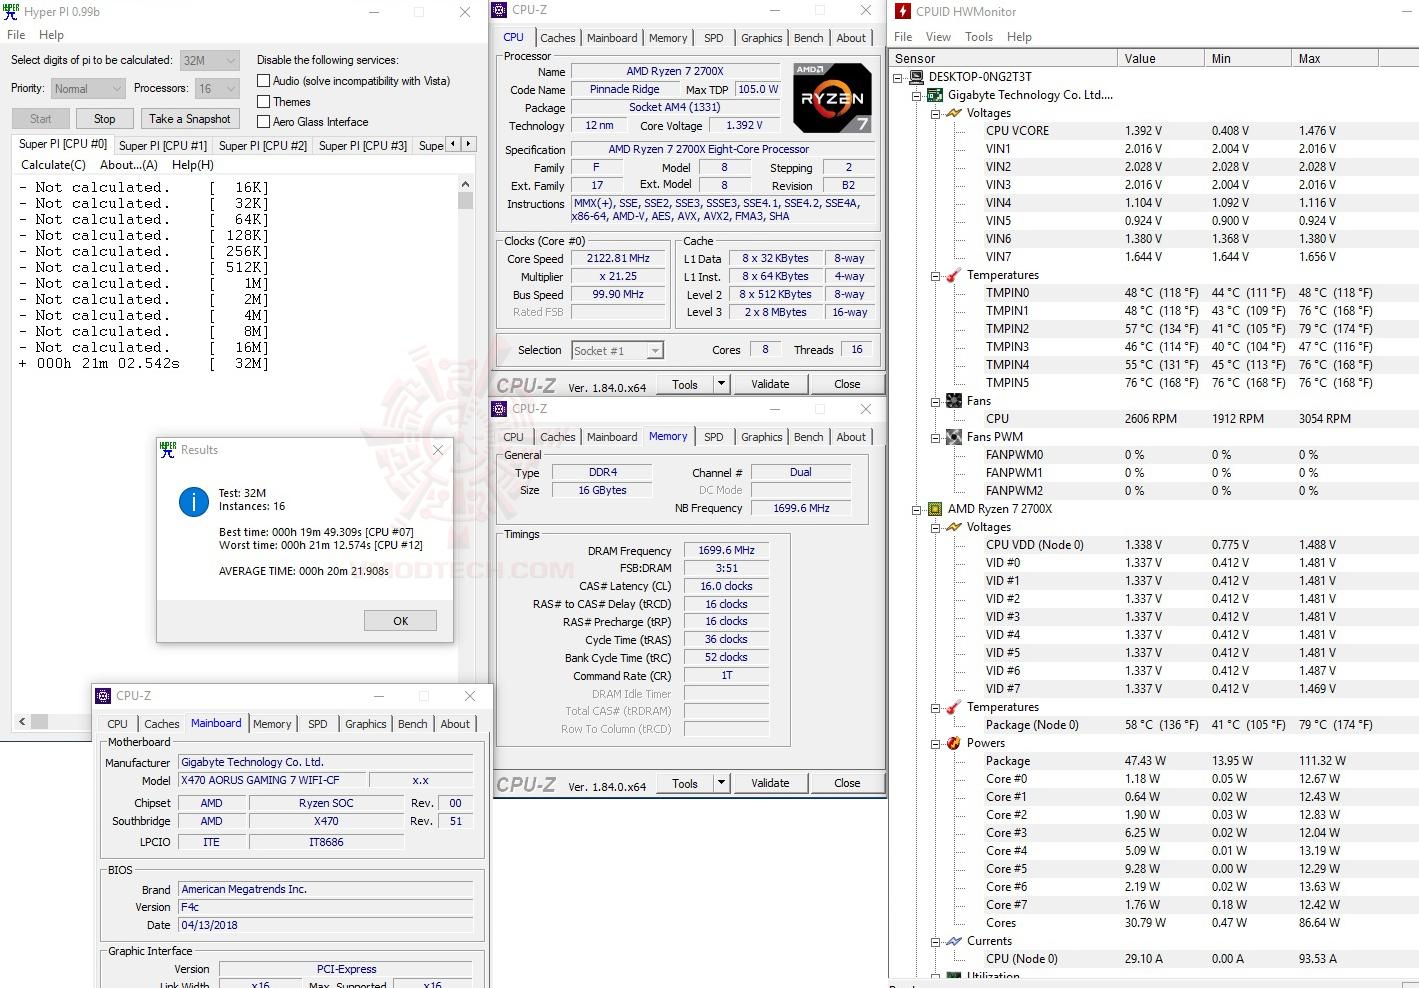 h32 2 AMD RYZEN 7 2700X PROCESSOR REVIEW